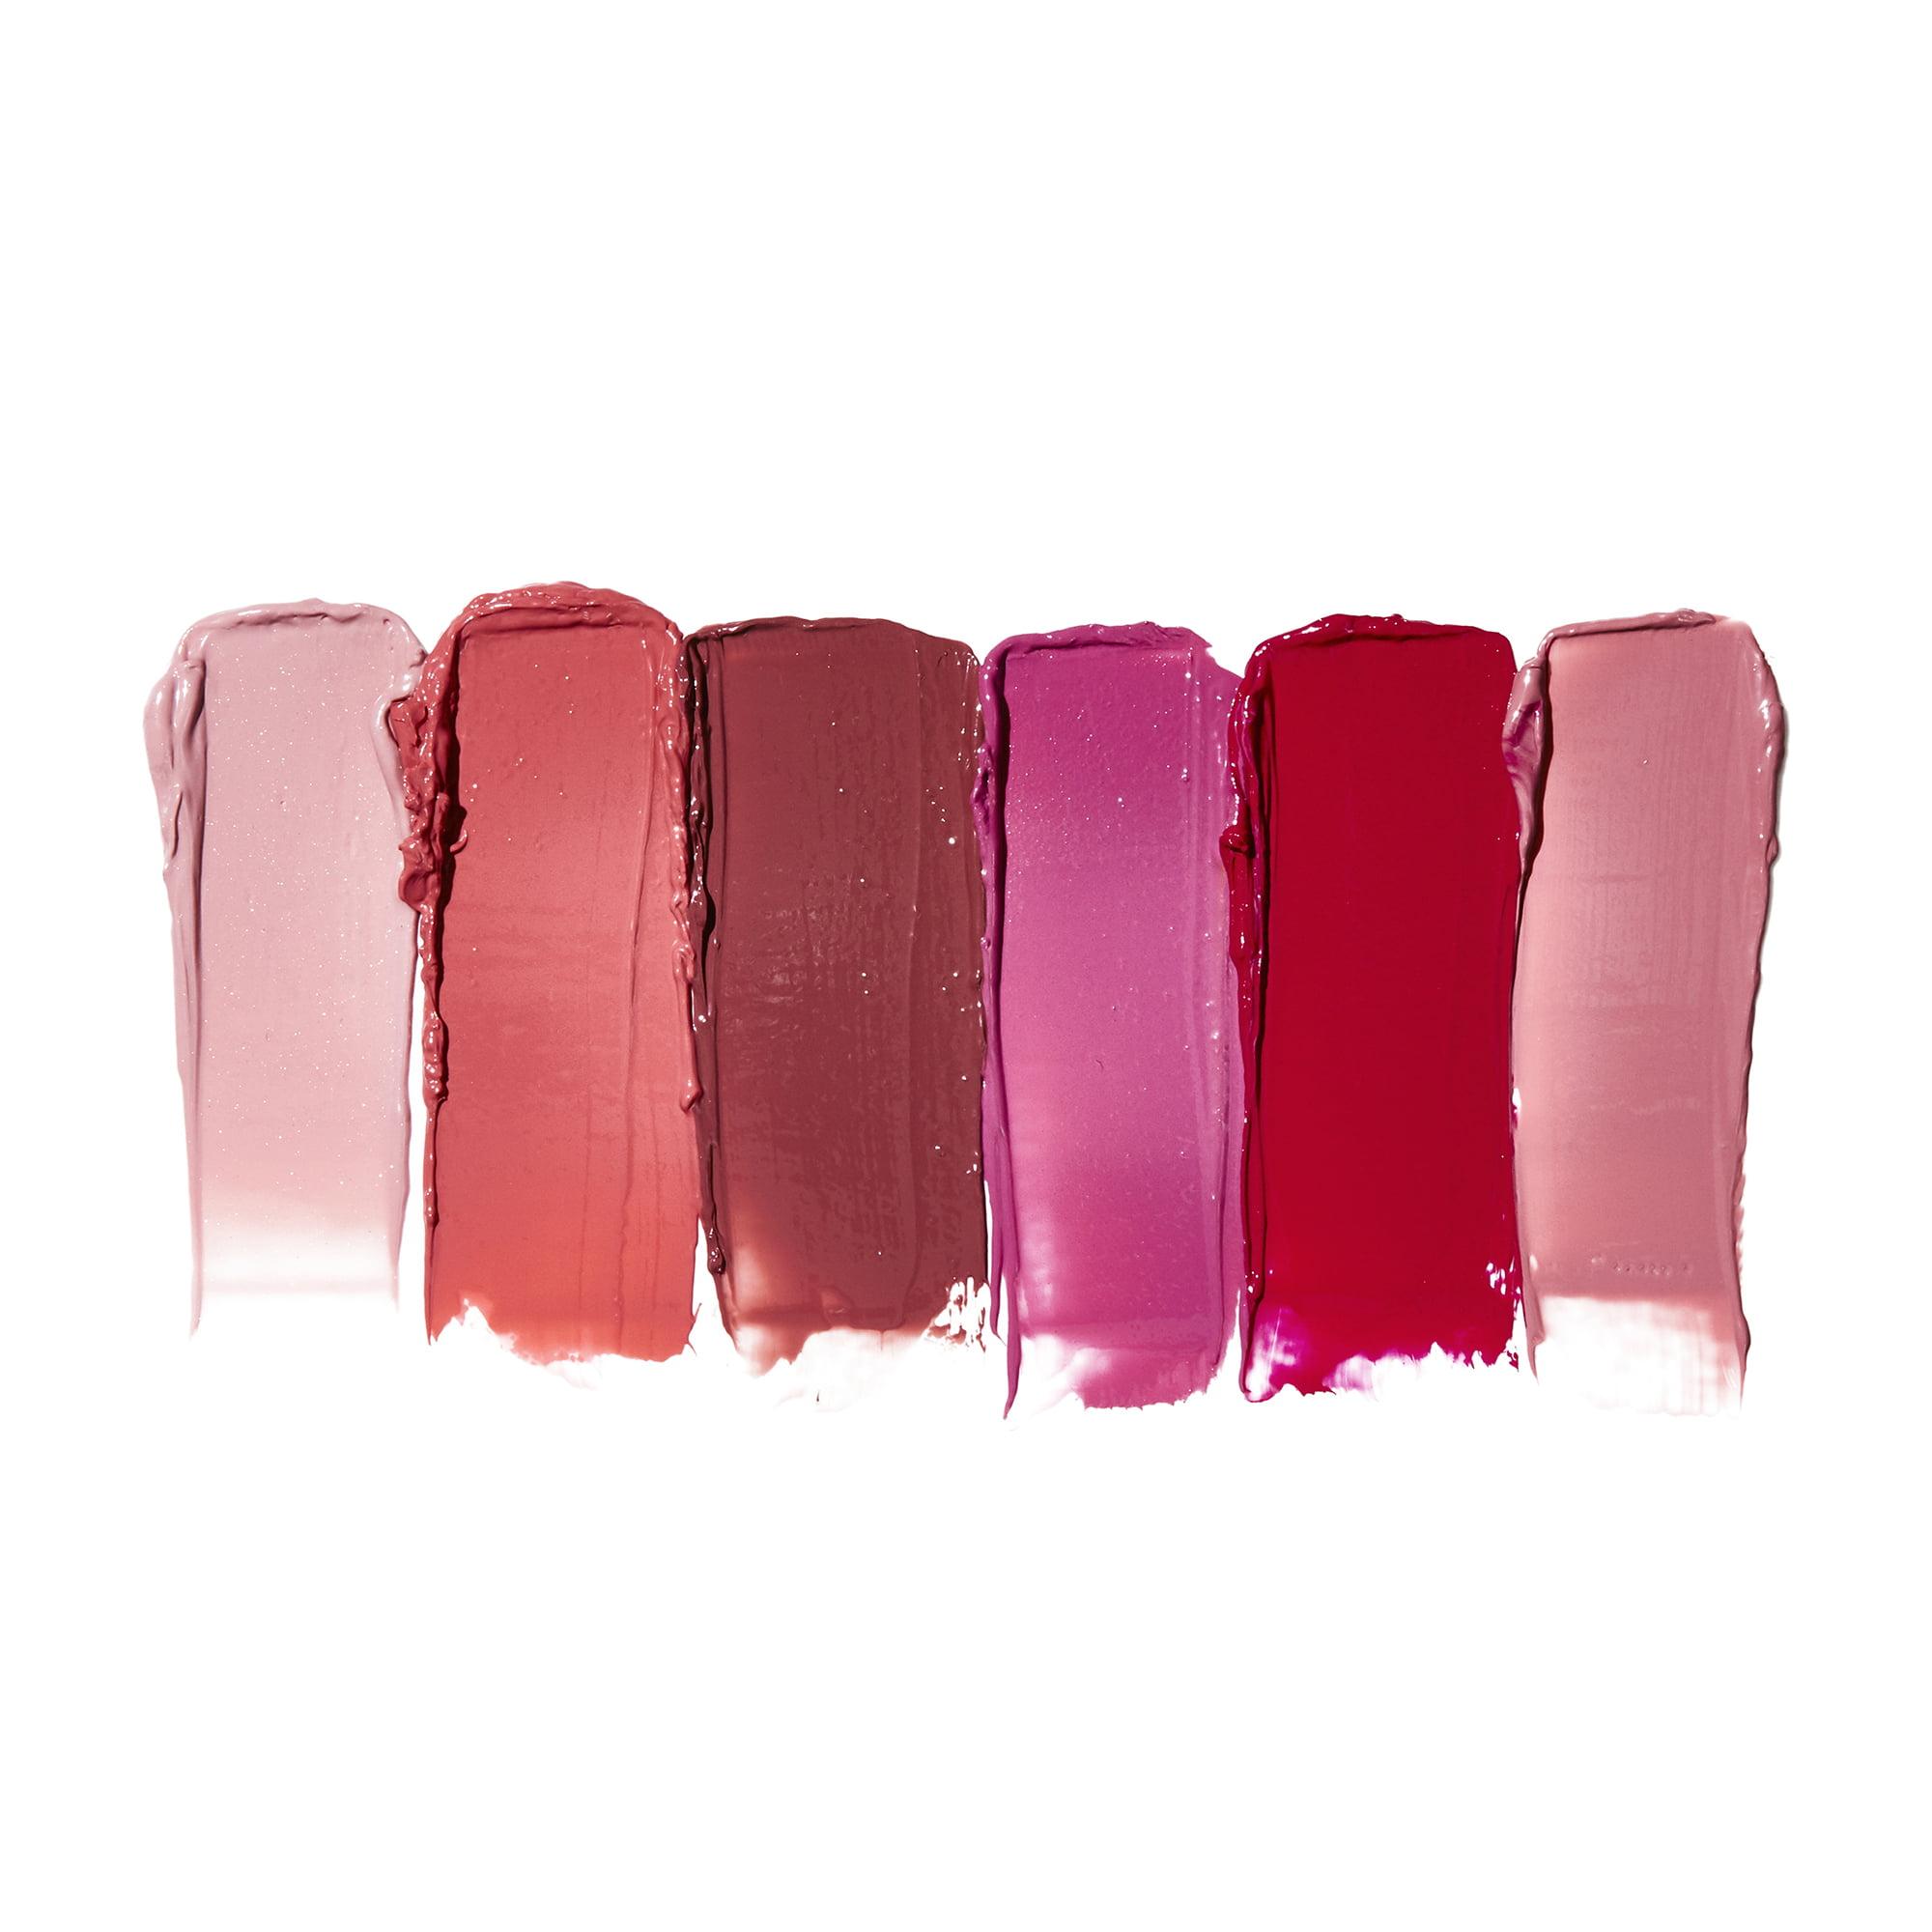 Runway Ready Lip Palette - Pink Kiss by e.l.f. #13